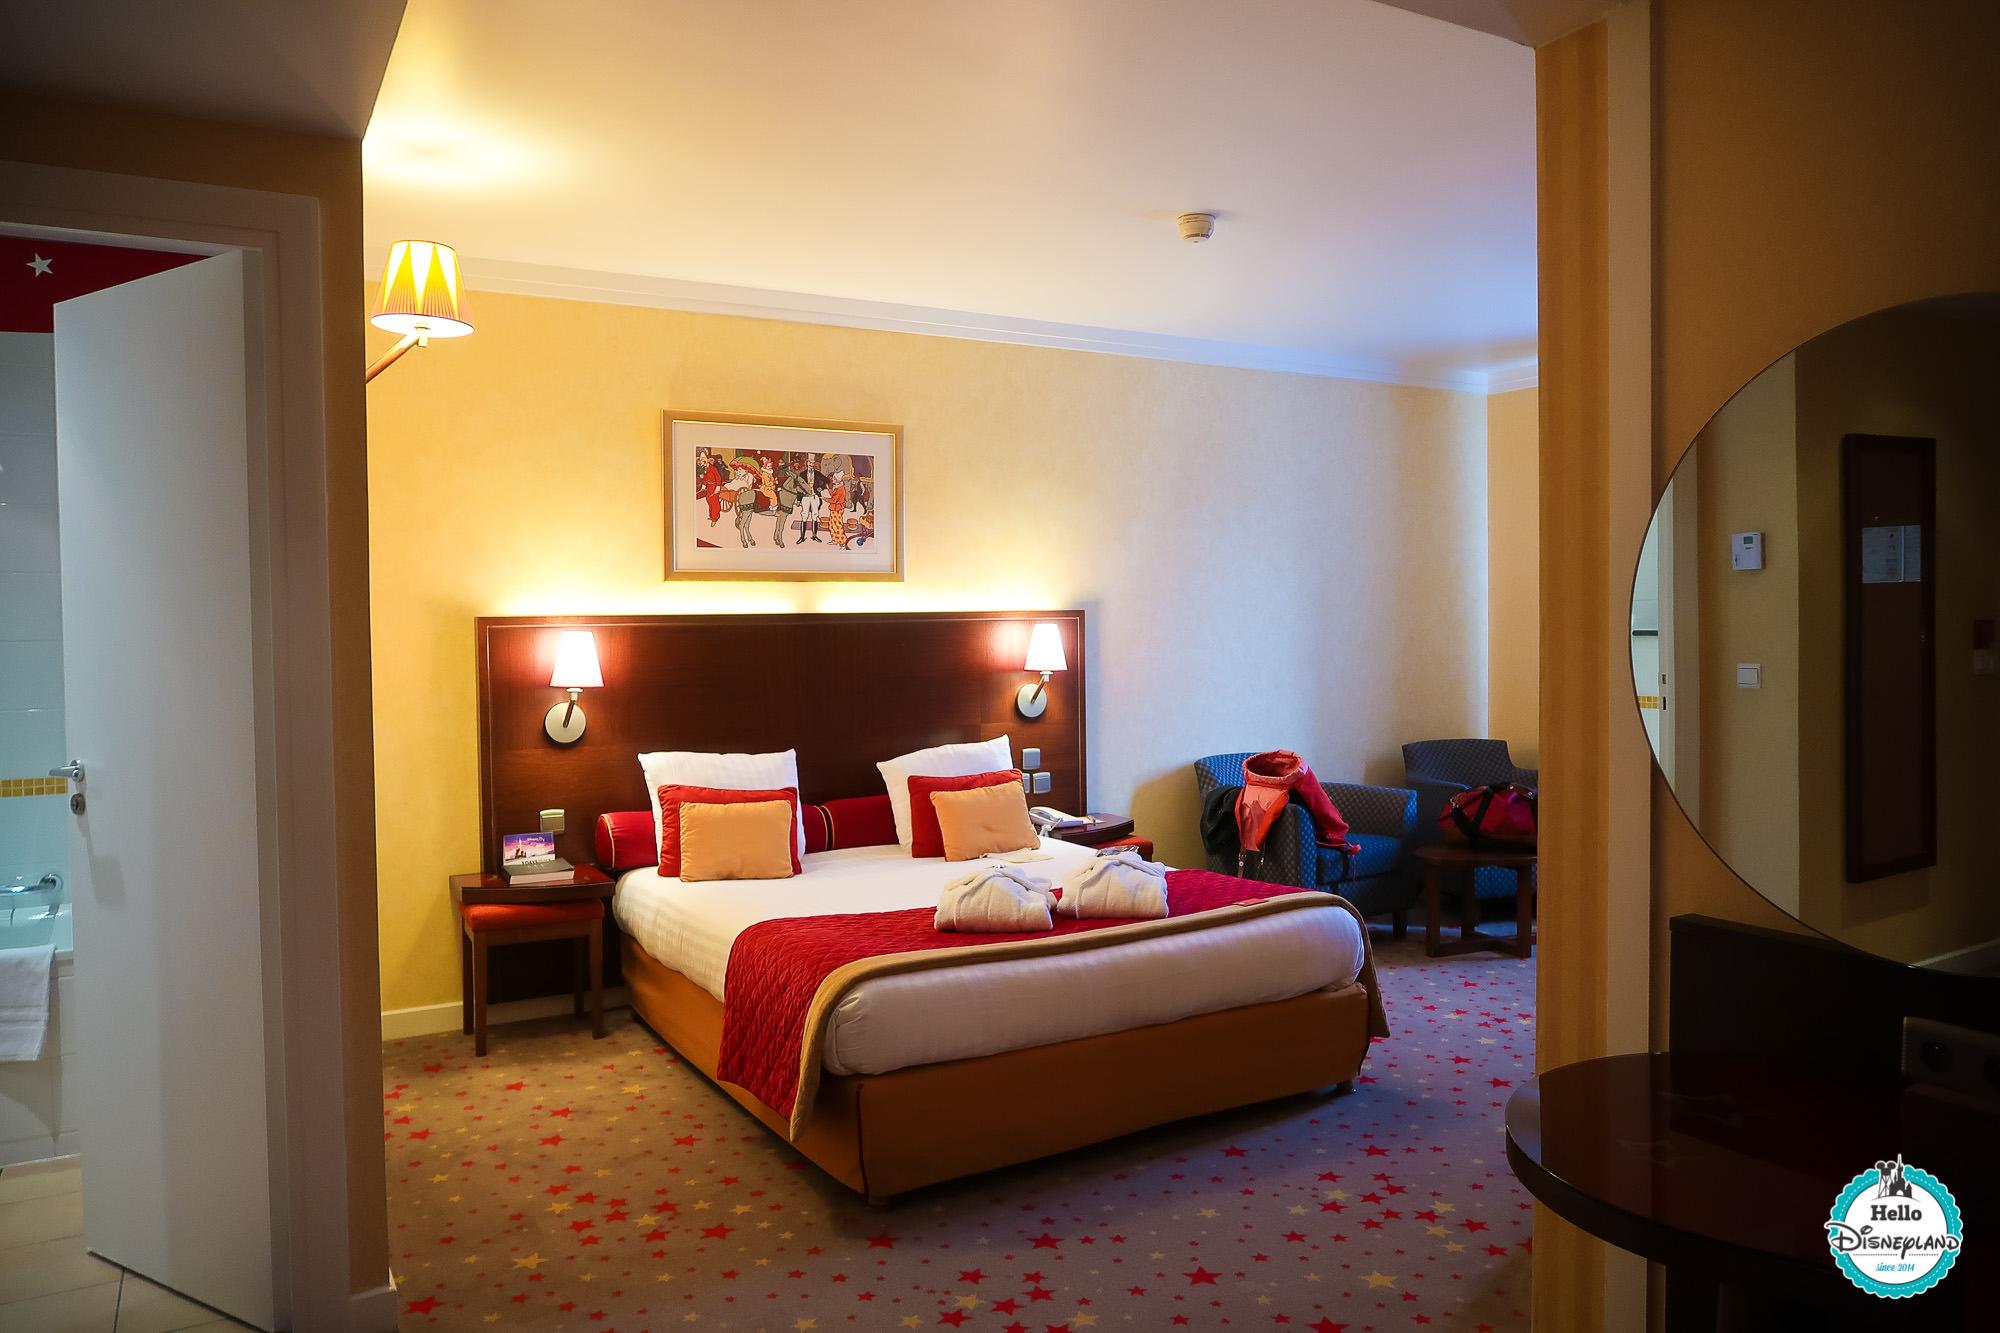 Magic Circus Vienna House Hotel - Disneyland Paris